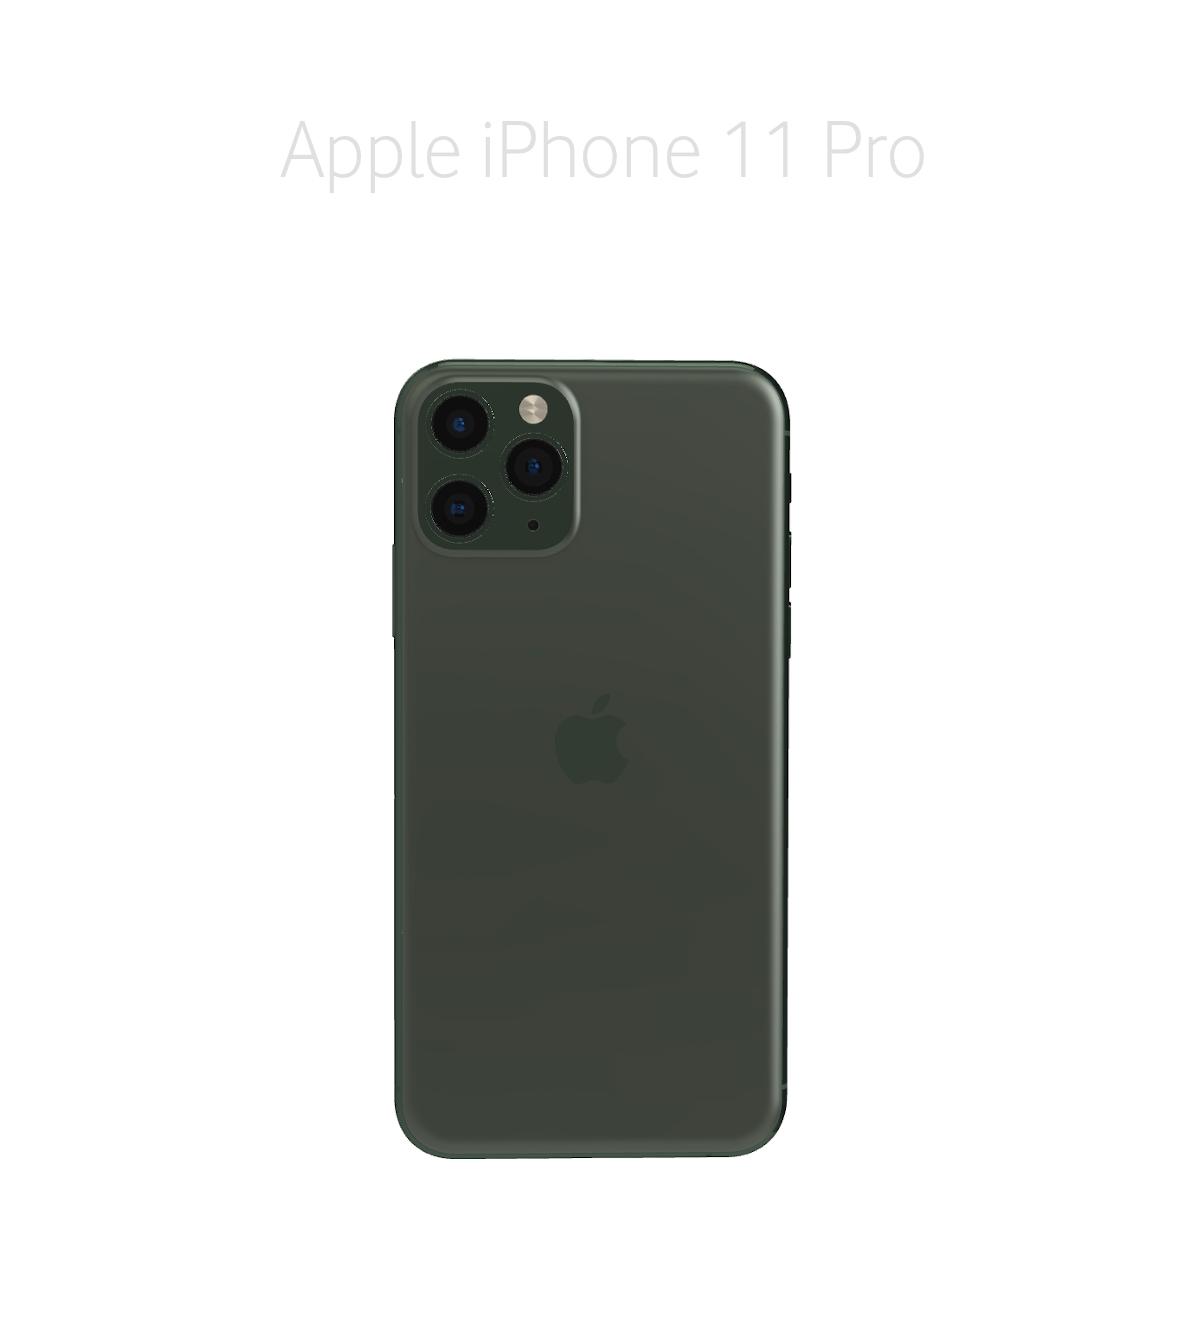 Laga glas/baksida iPhone 11 Pro